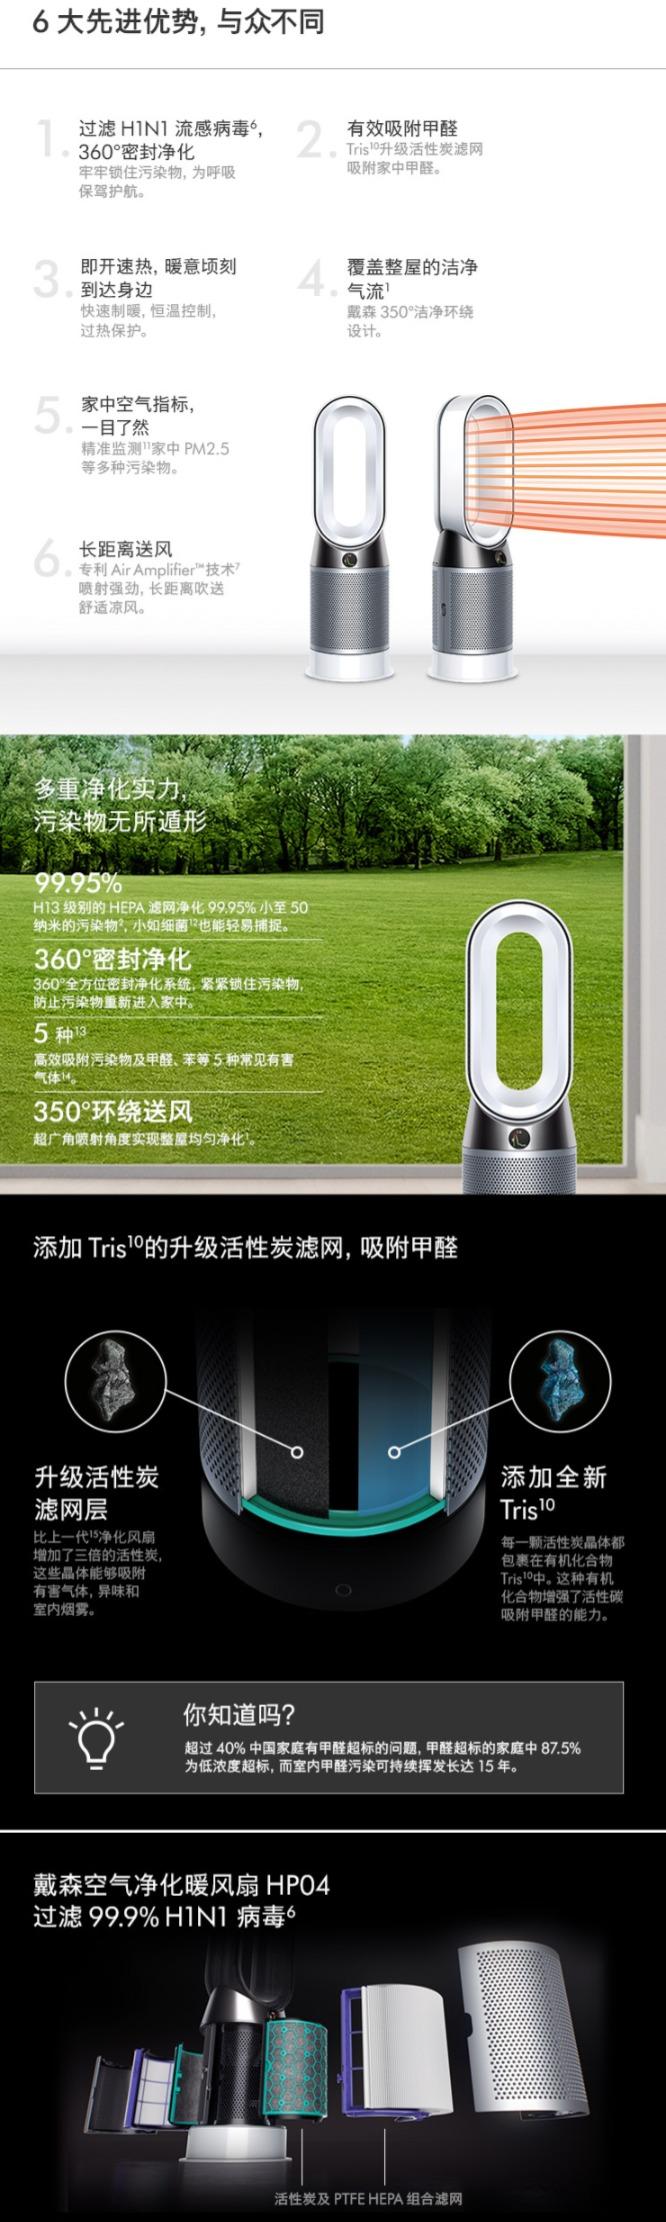 Dyson 戴森官网大促,精选多款空气净化风扇立减100加元,V10 Animal无绳吸尘器立减150加元!